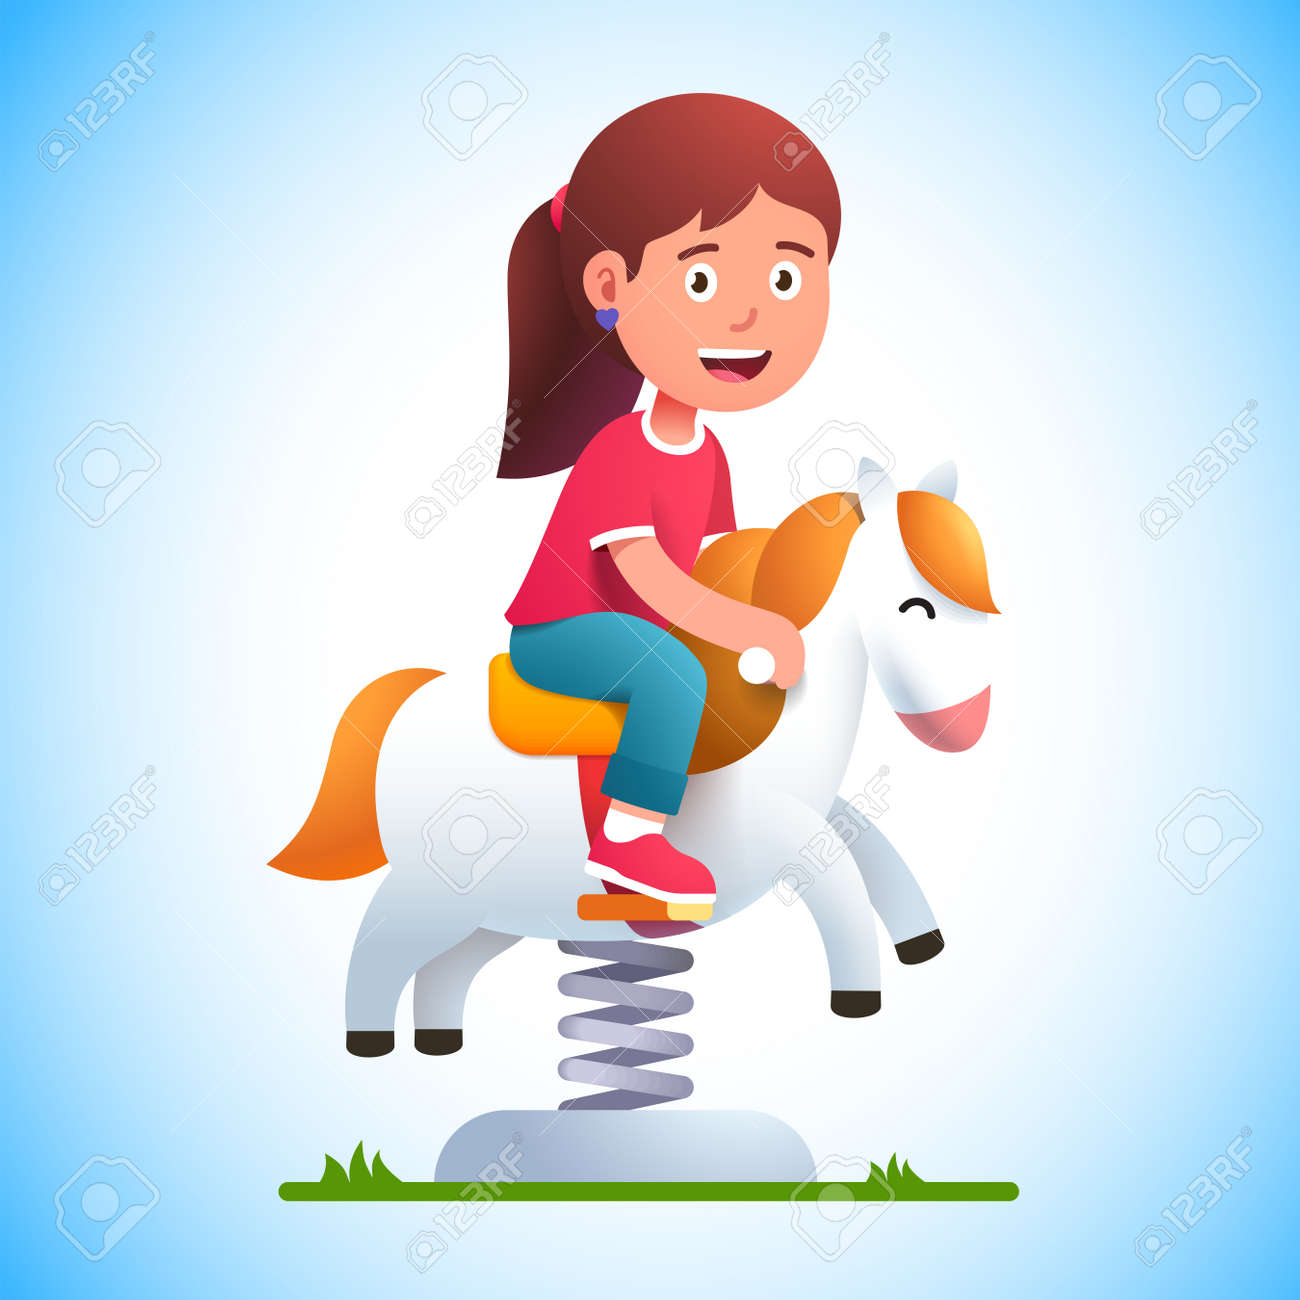 Preschool kid play riding rocking horse on spring - 153086103